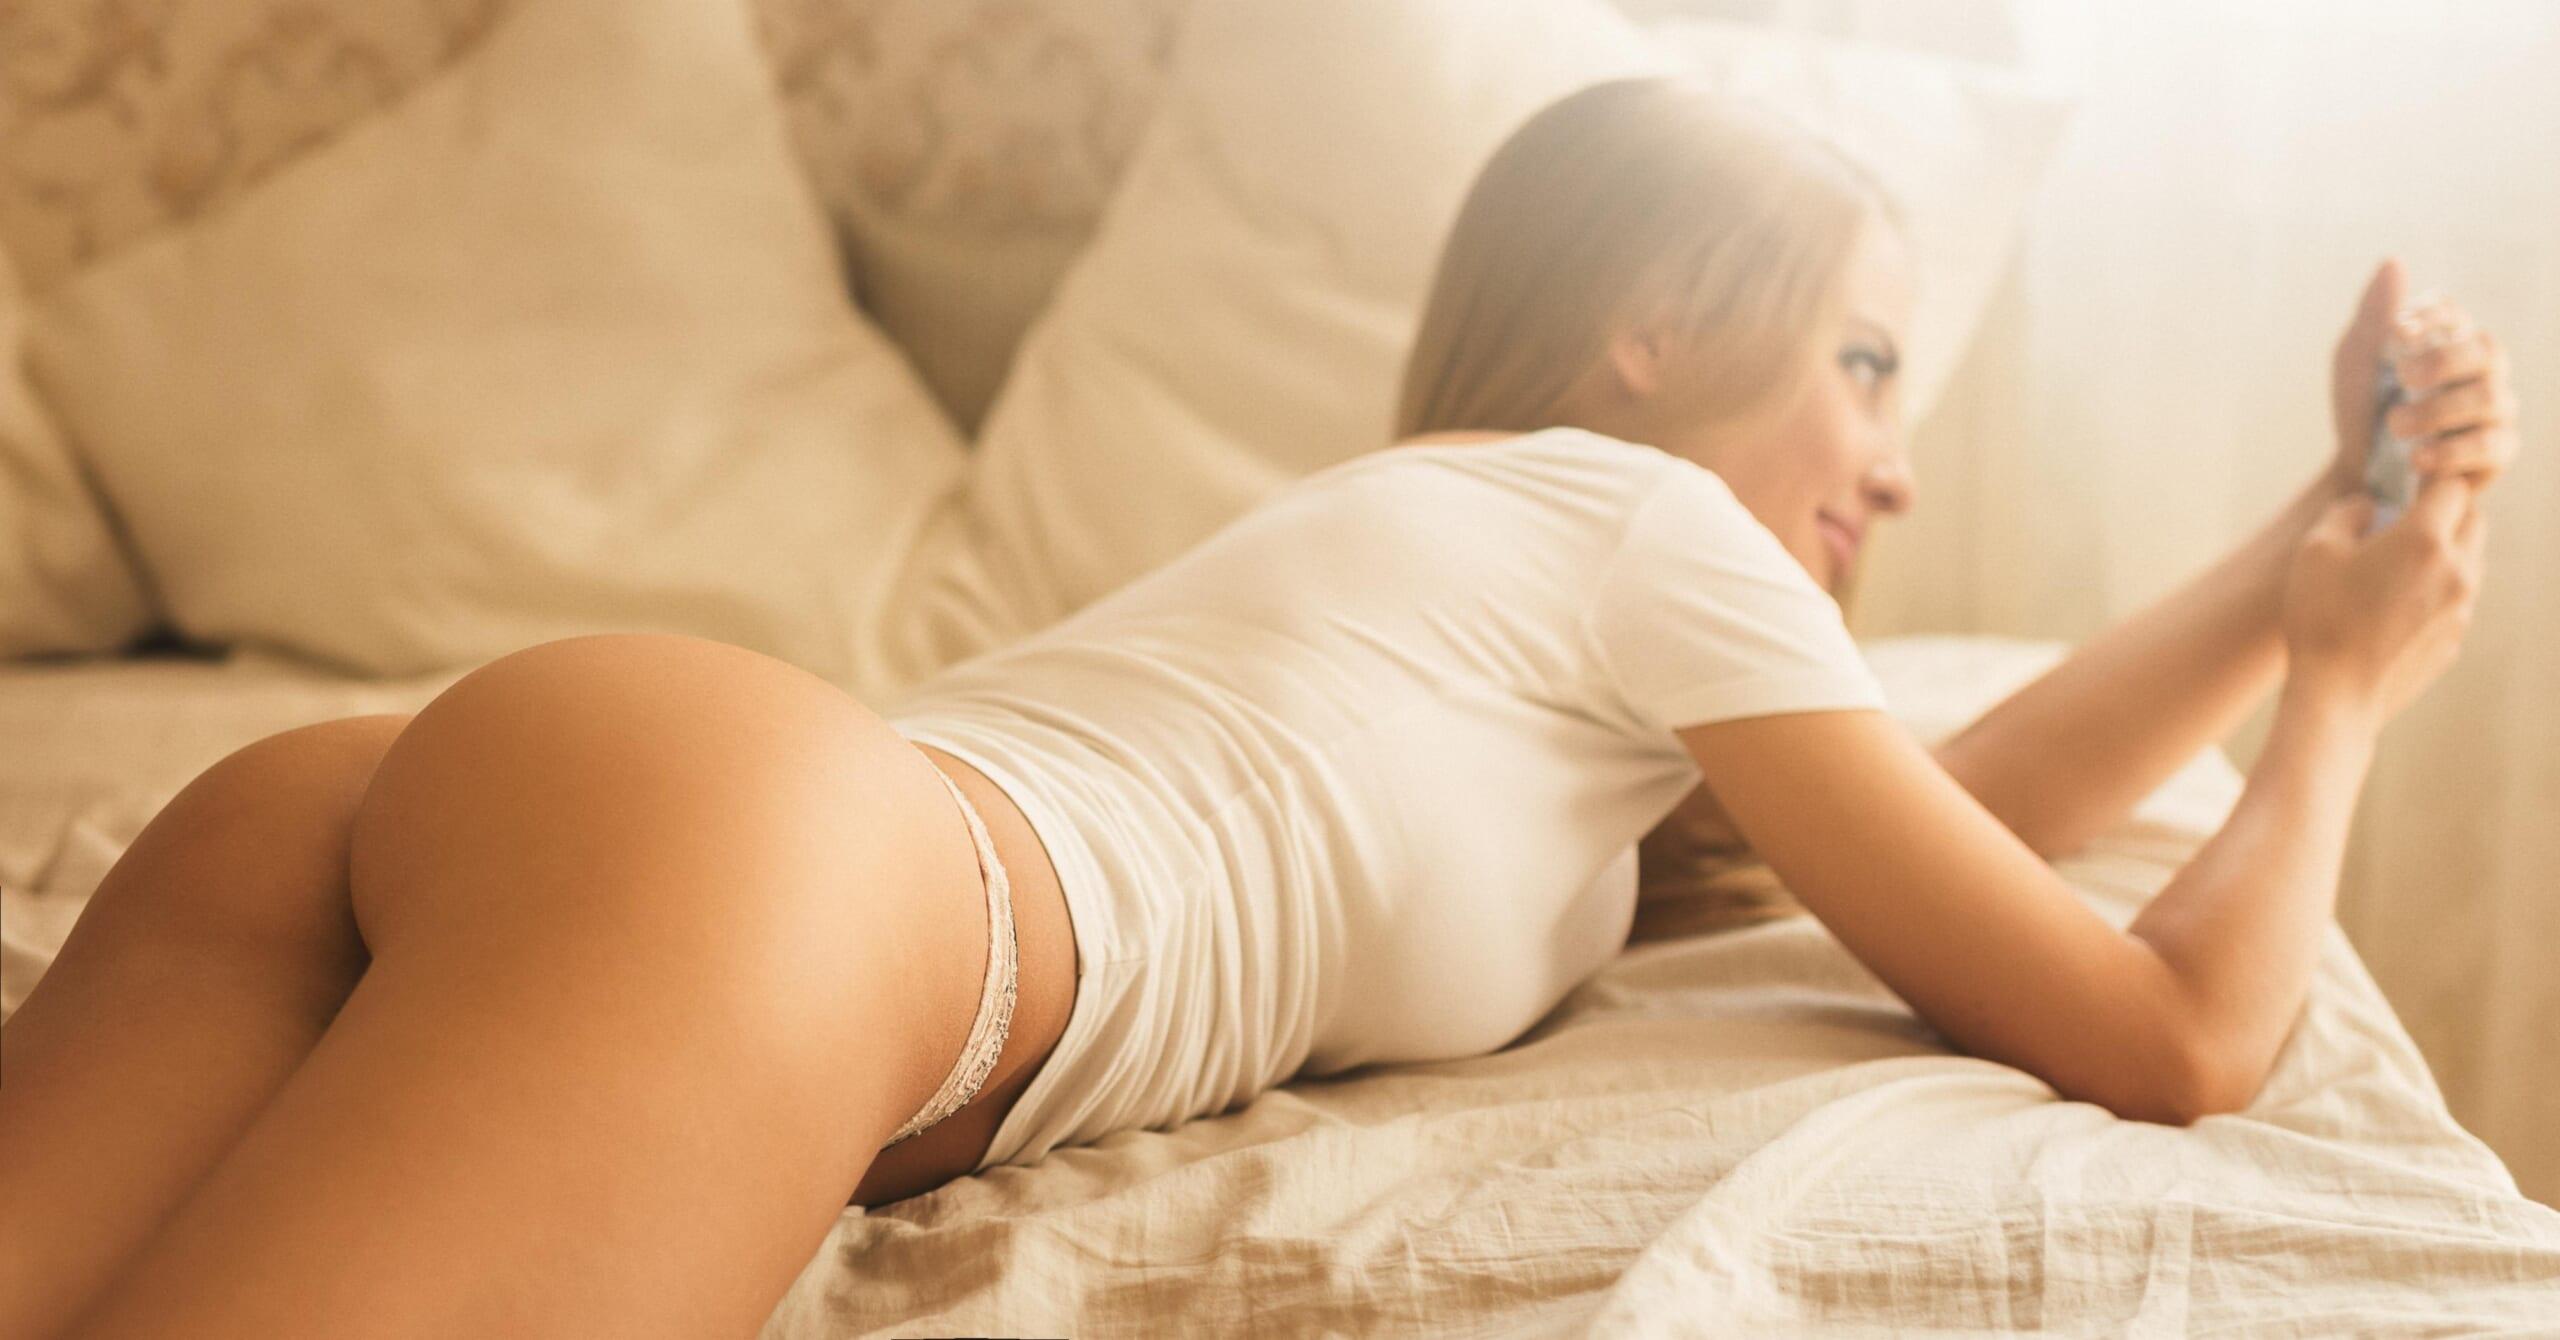 Sexy smartphone